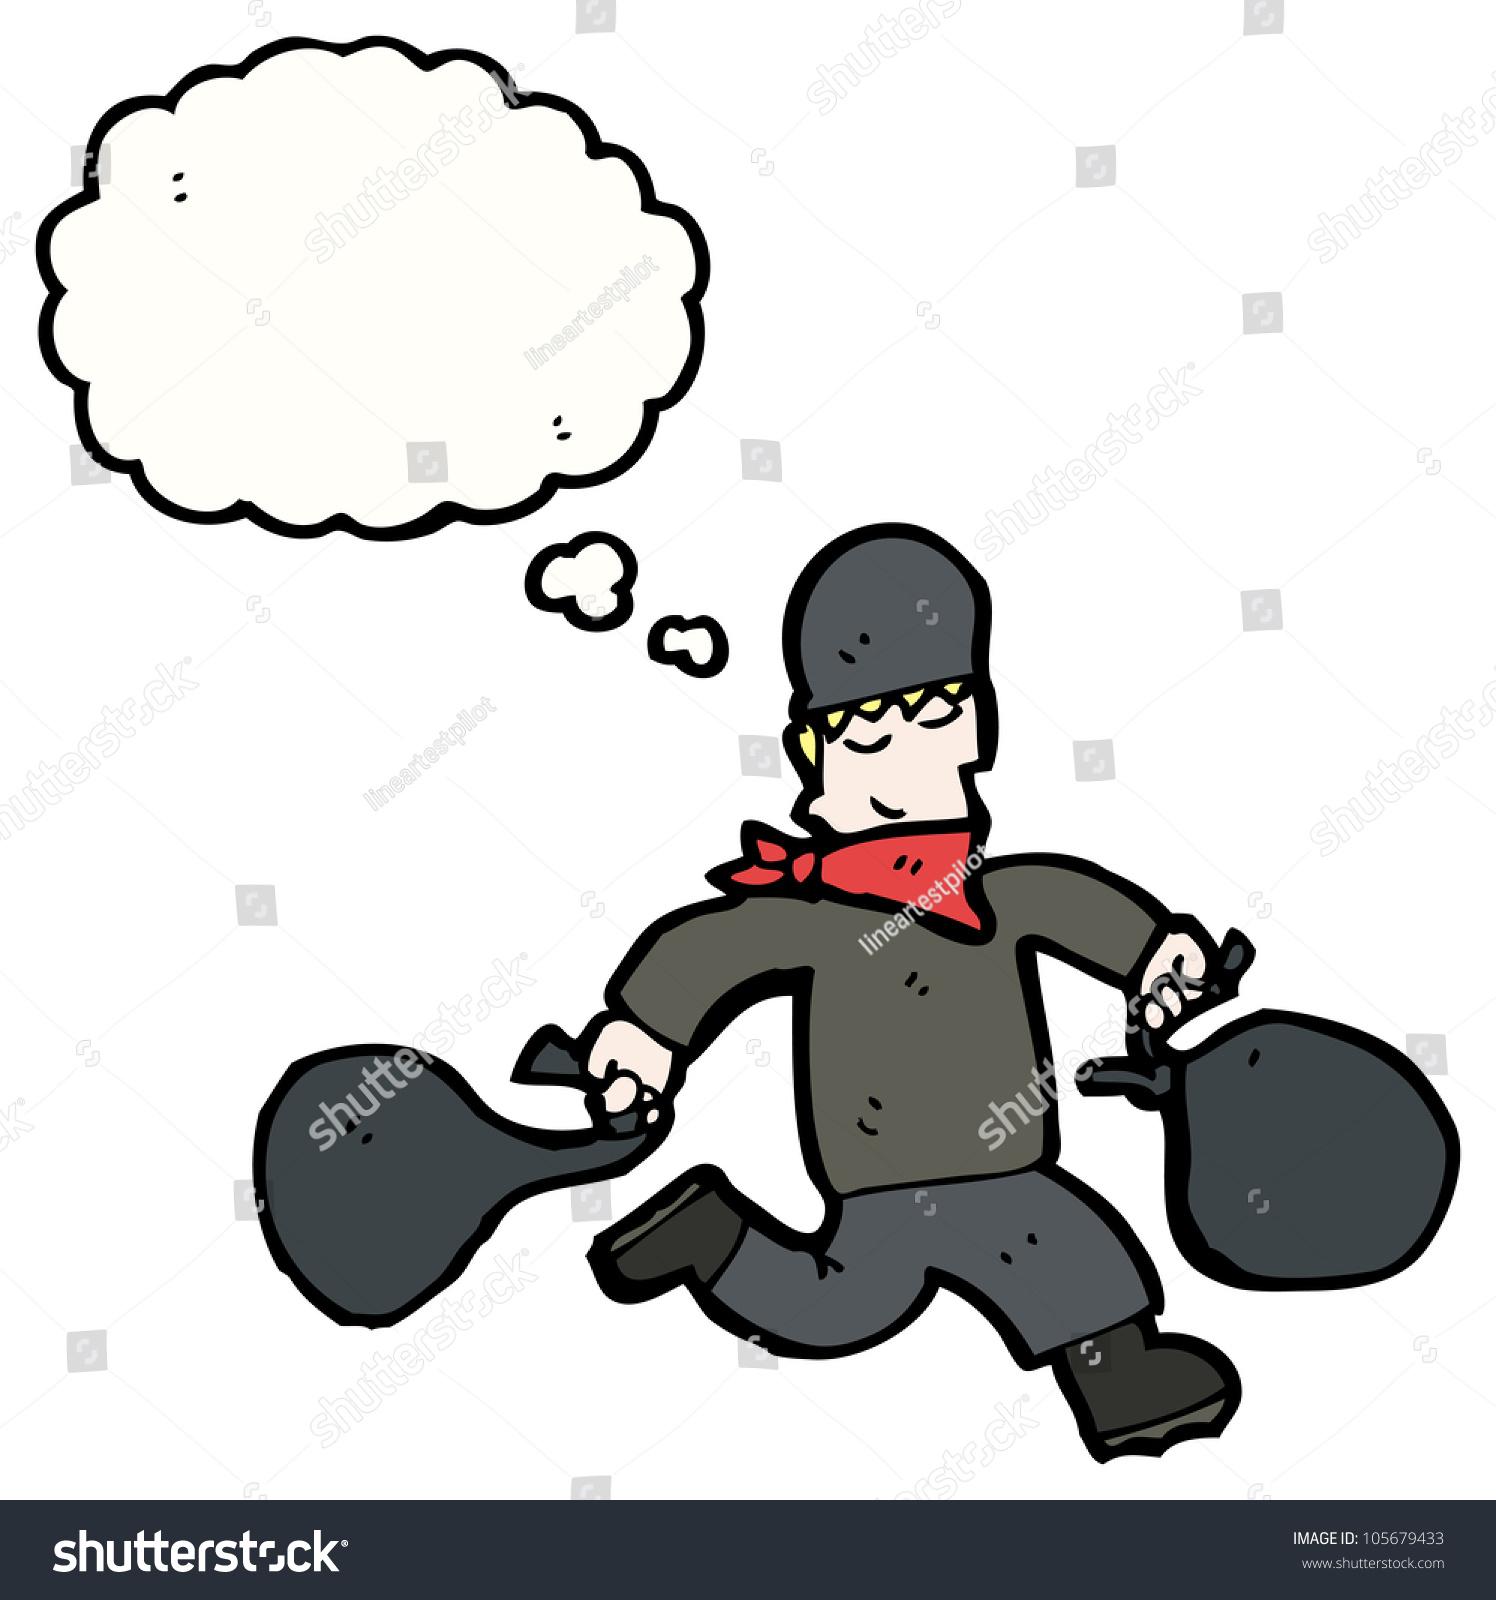 Cartoon Bank Robber Bags Swag Stock Illustration 105679433